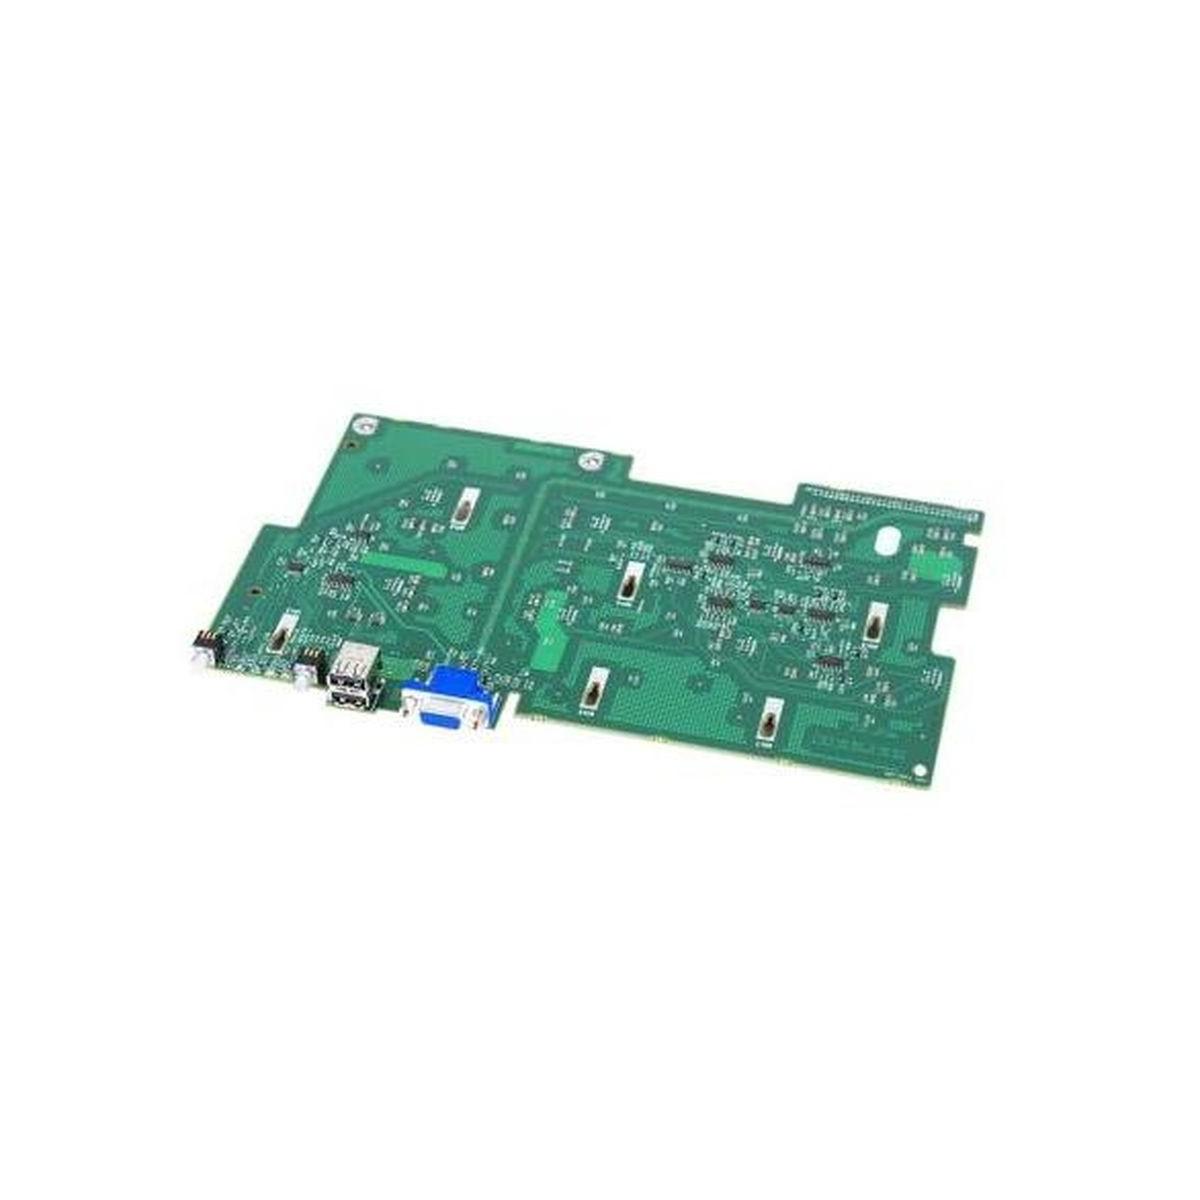 DYSK 600GB DELL SAS 3,5' 10K 6G 0R752K